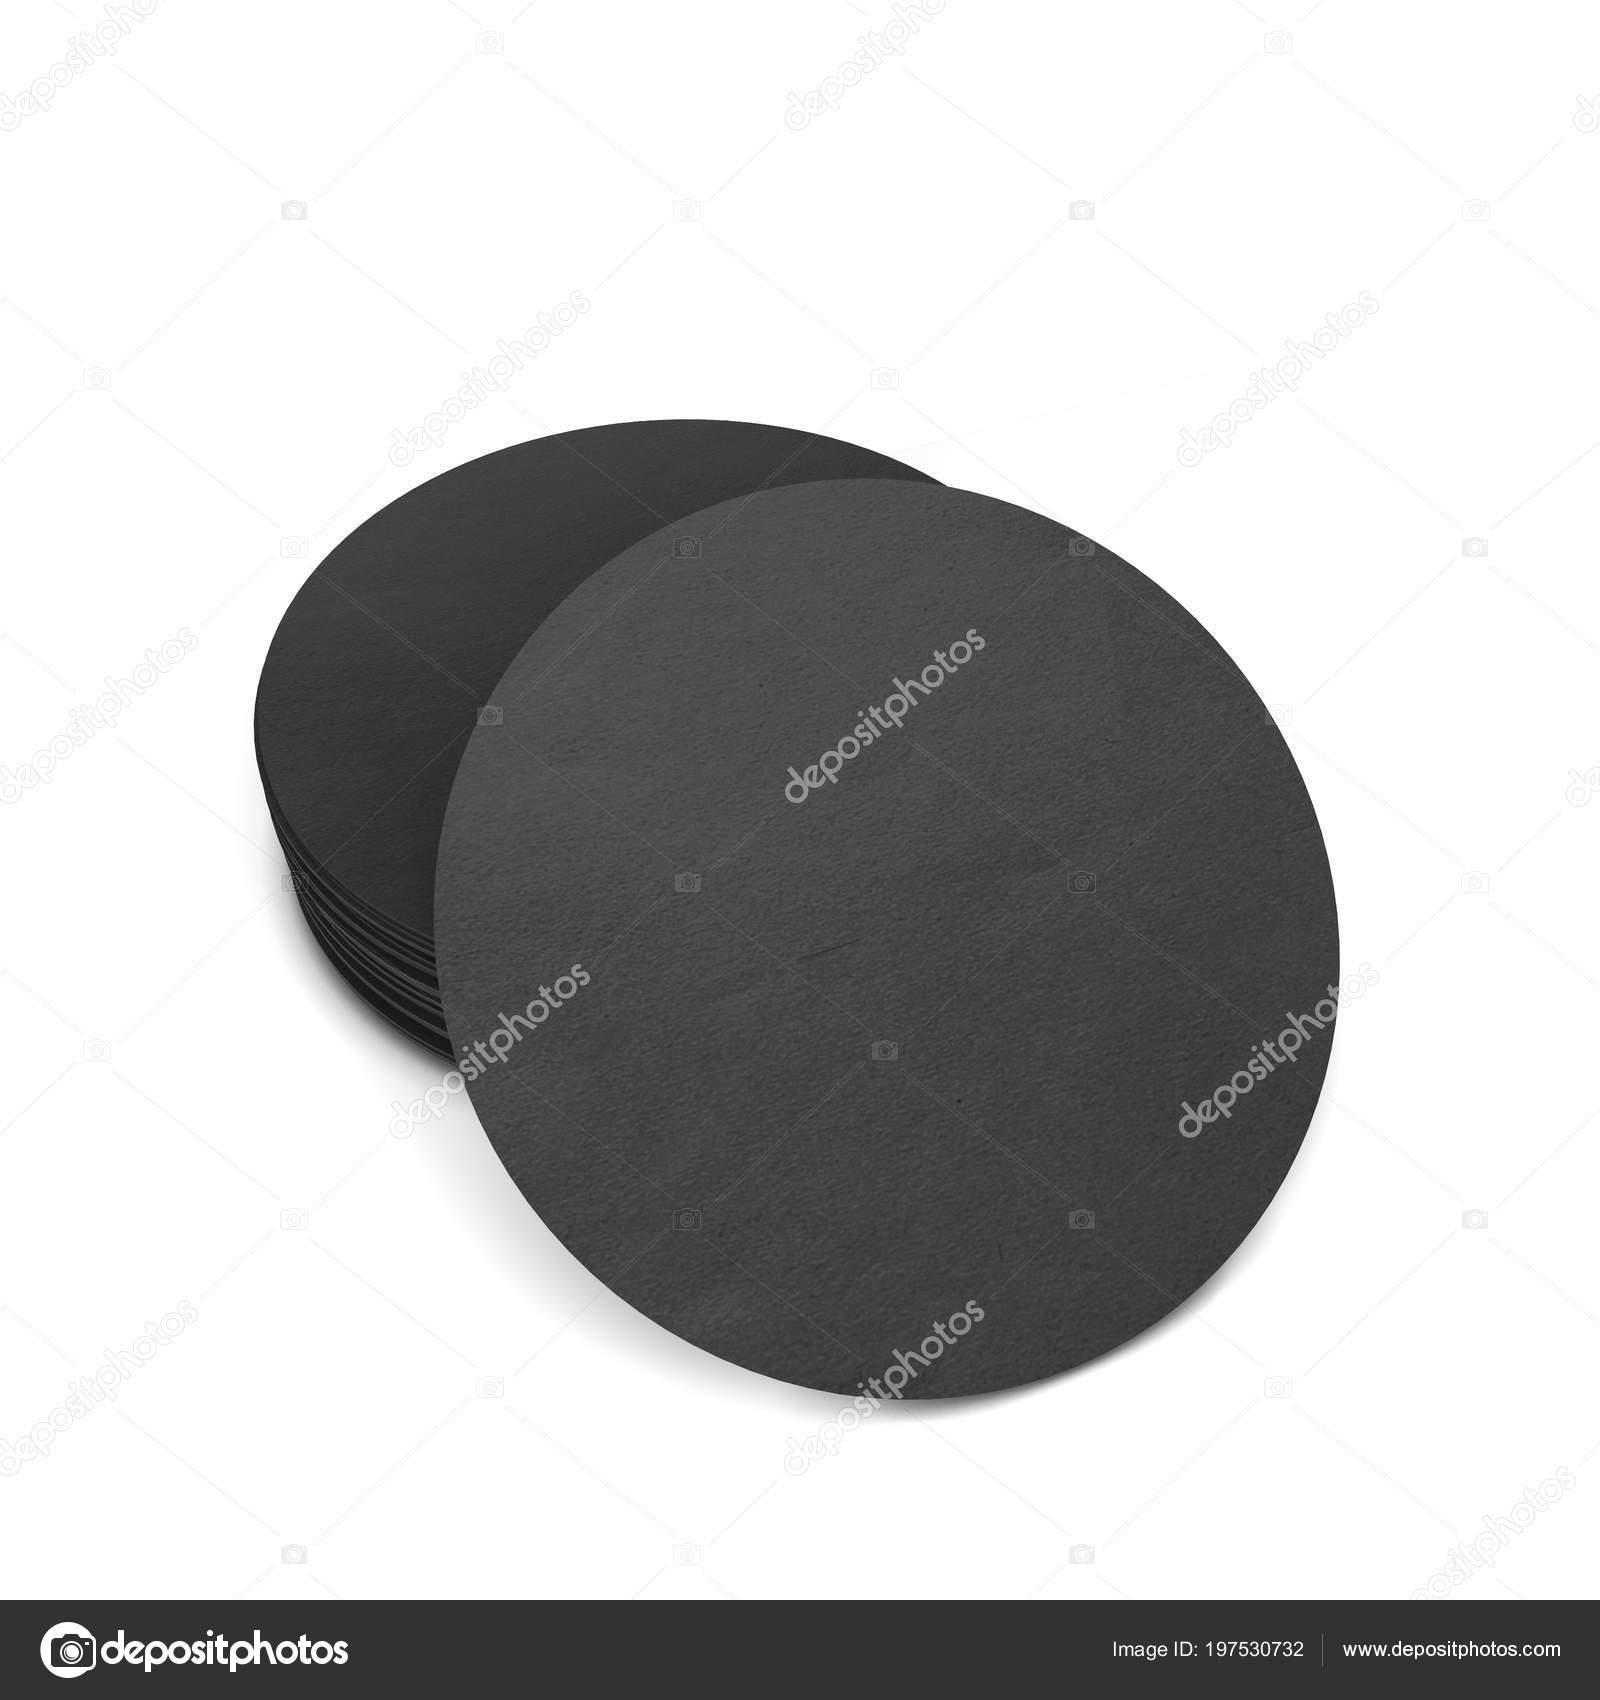 Blank Coasters Template Illustration Isolated White Background Stock Photo